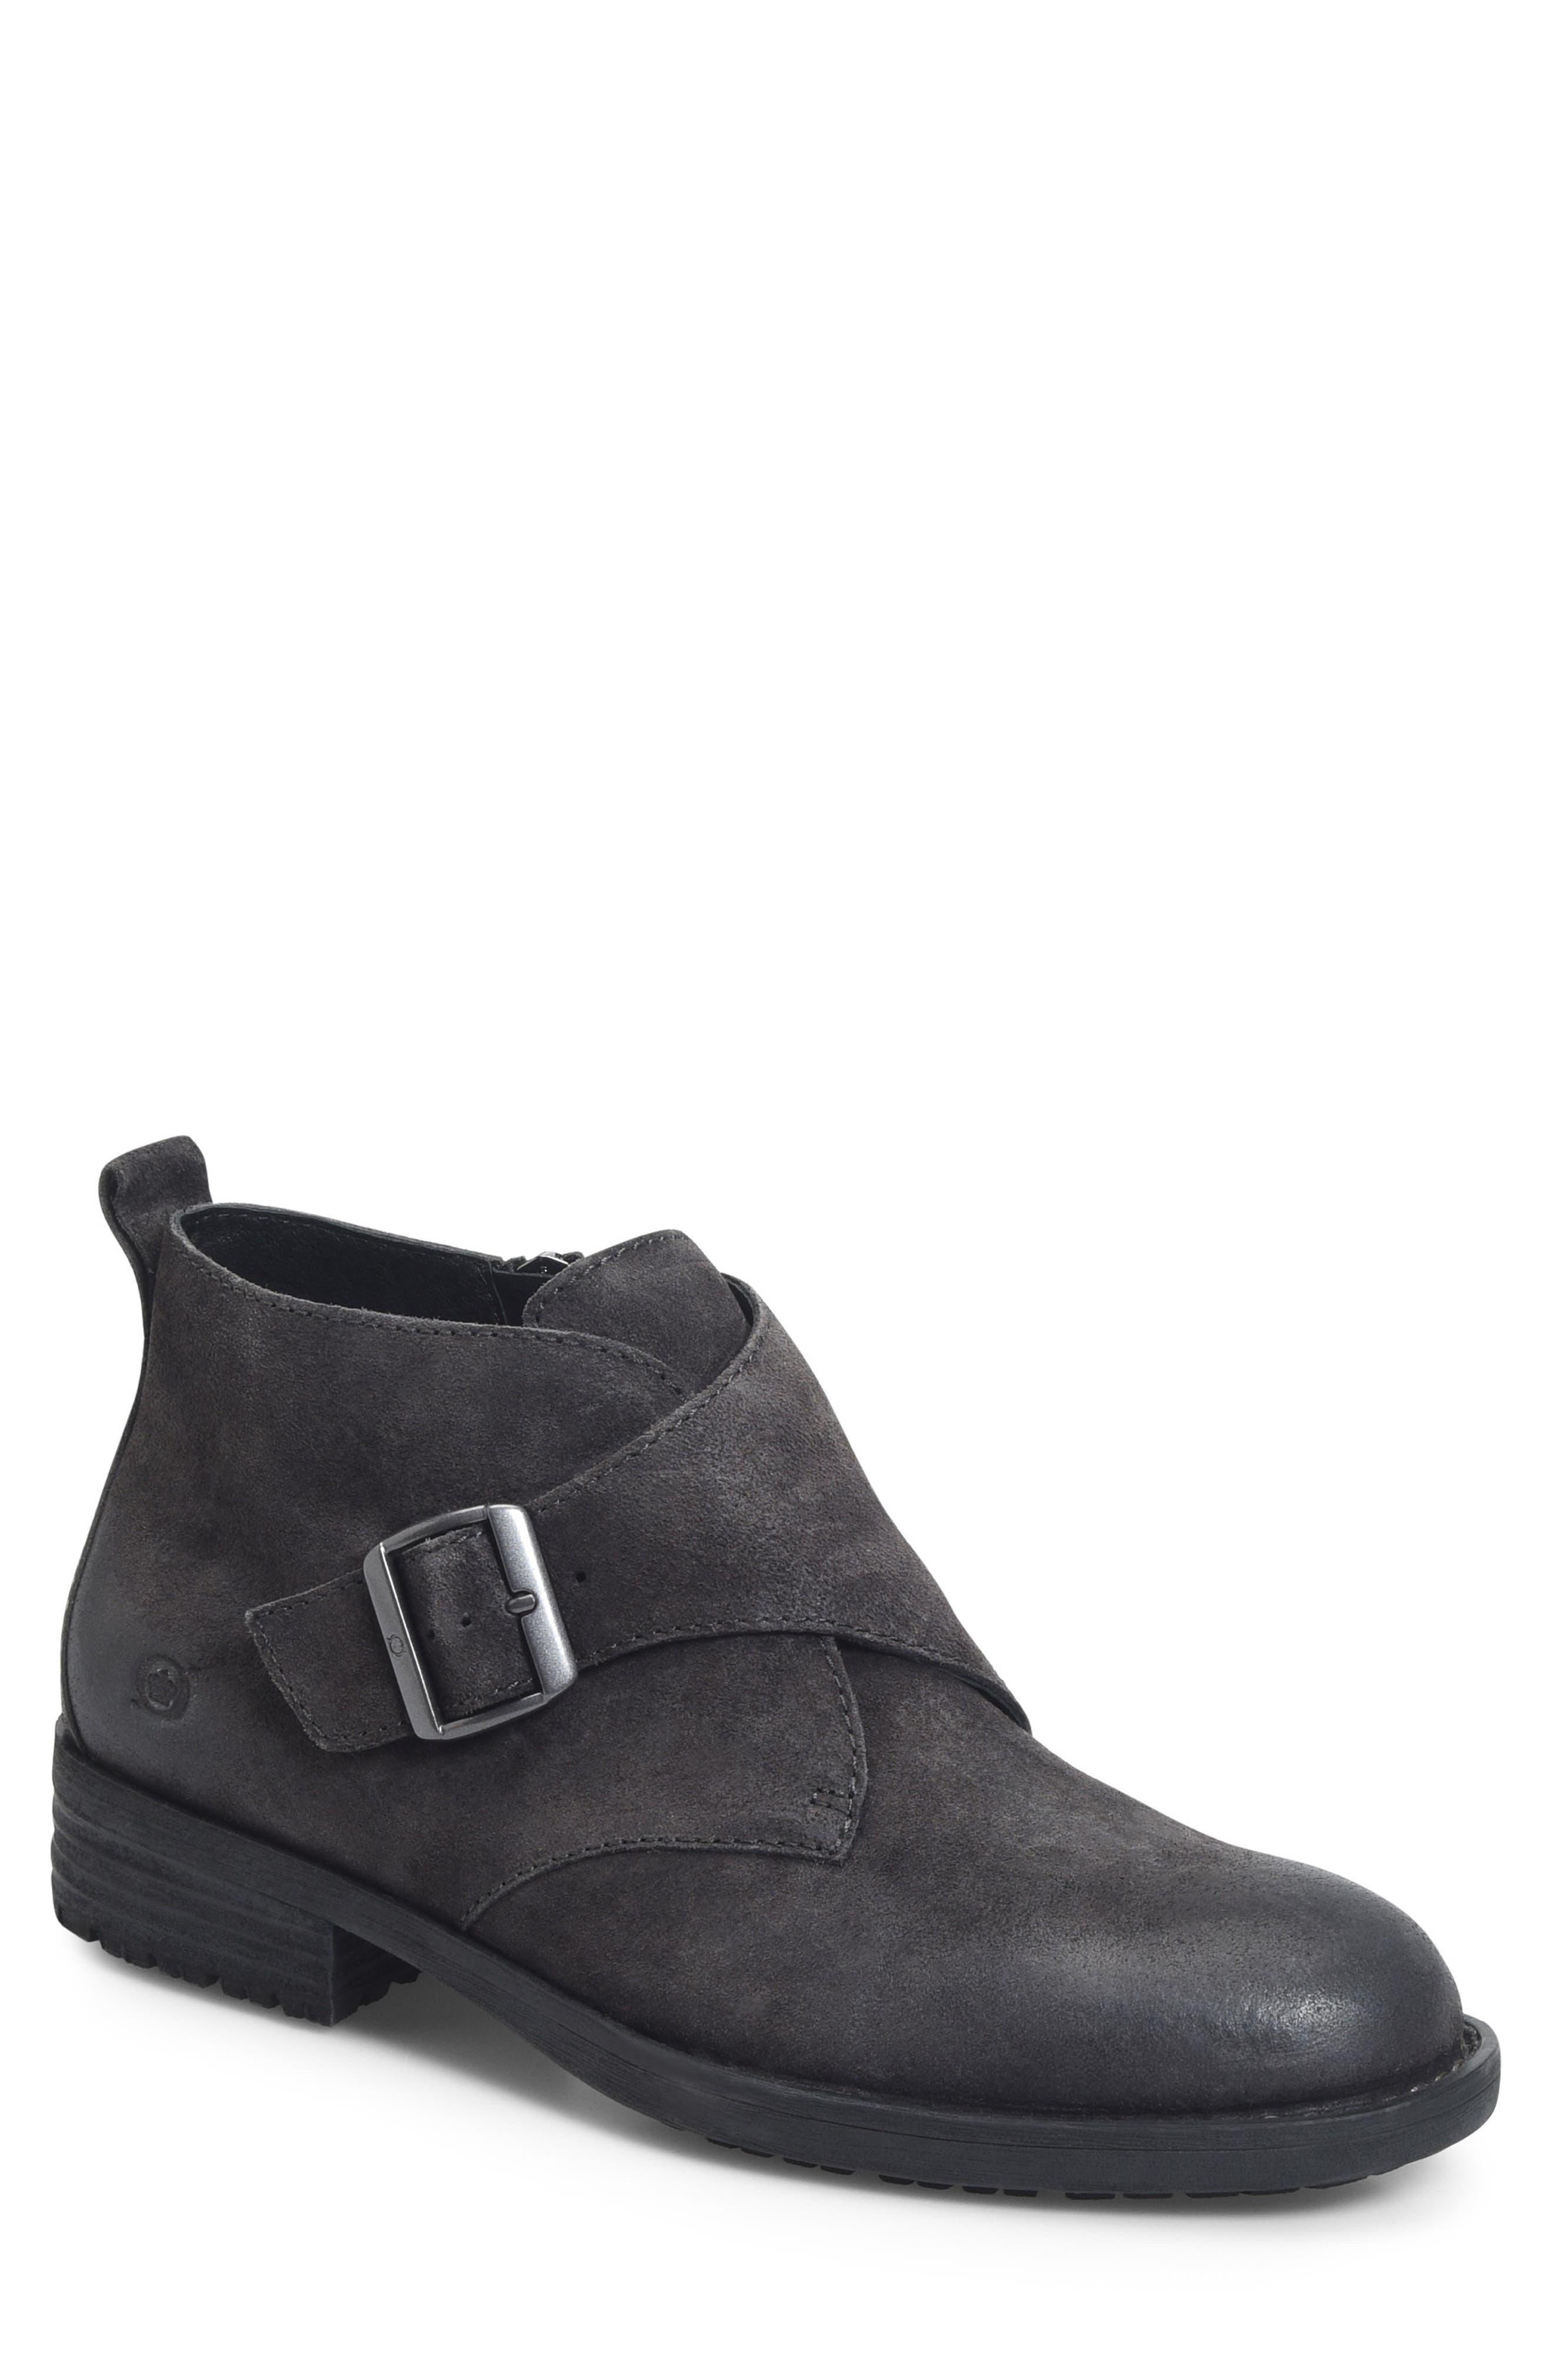 Drum Monk Strap Boot,                         Main,                         color, 001